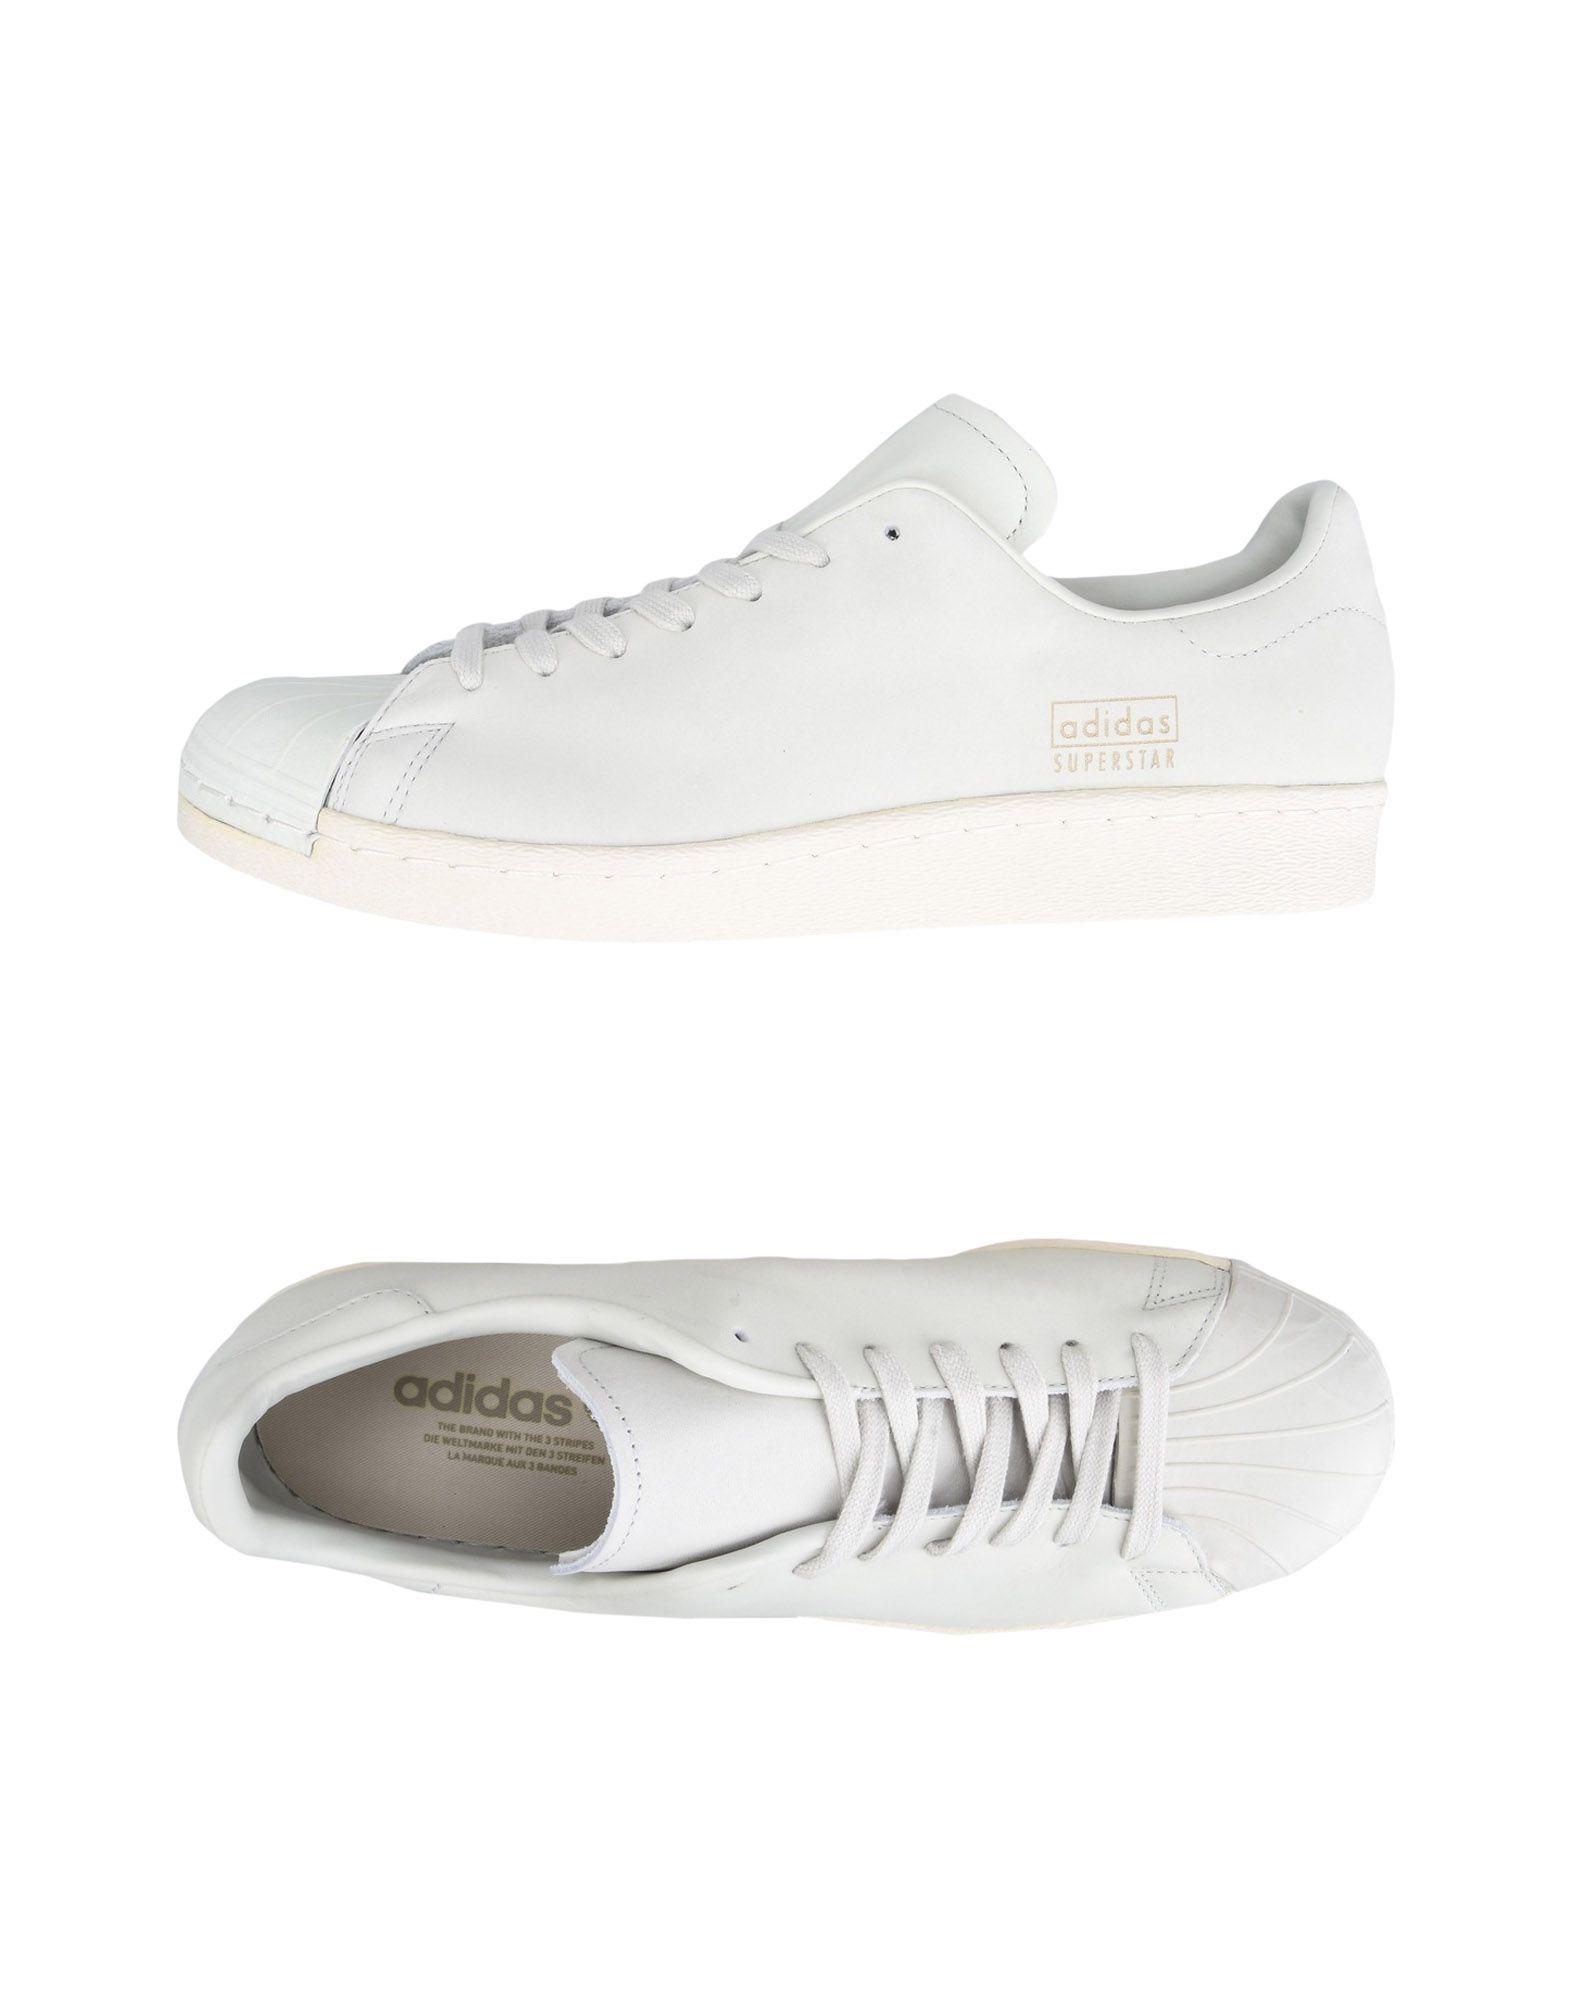 Sneakers Adidas Originals Superstar 80S Clean - Uomo - 11251614VK